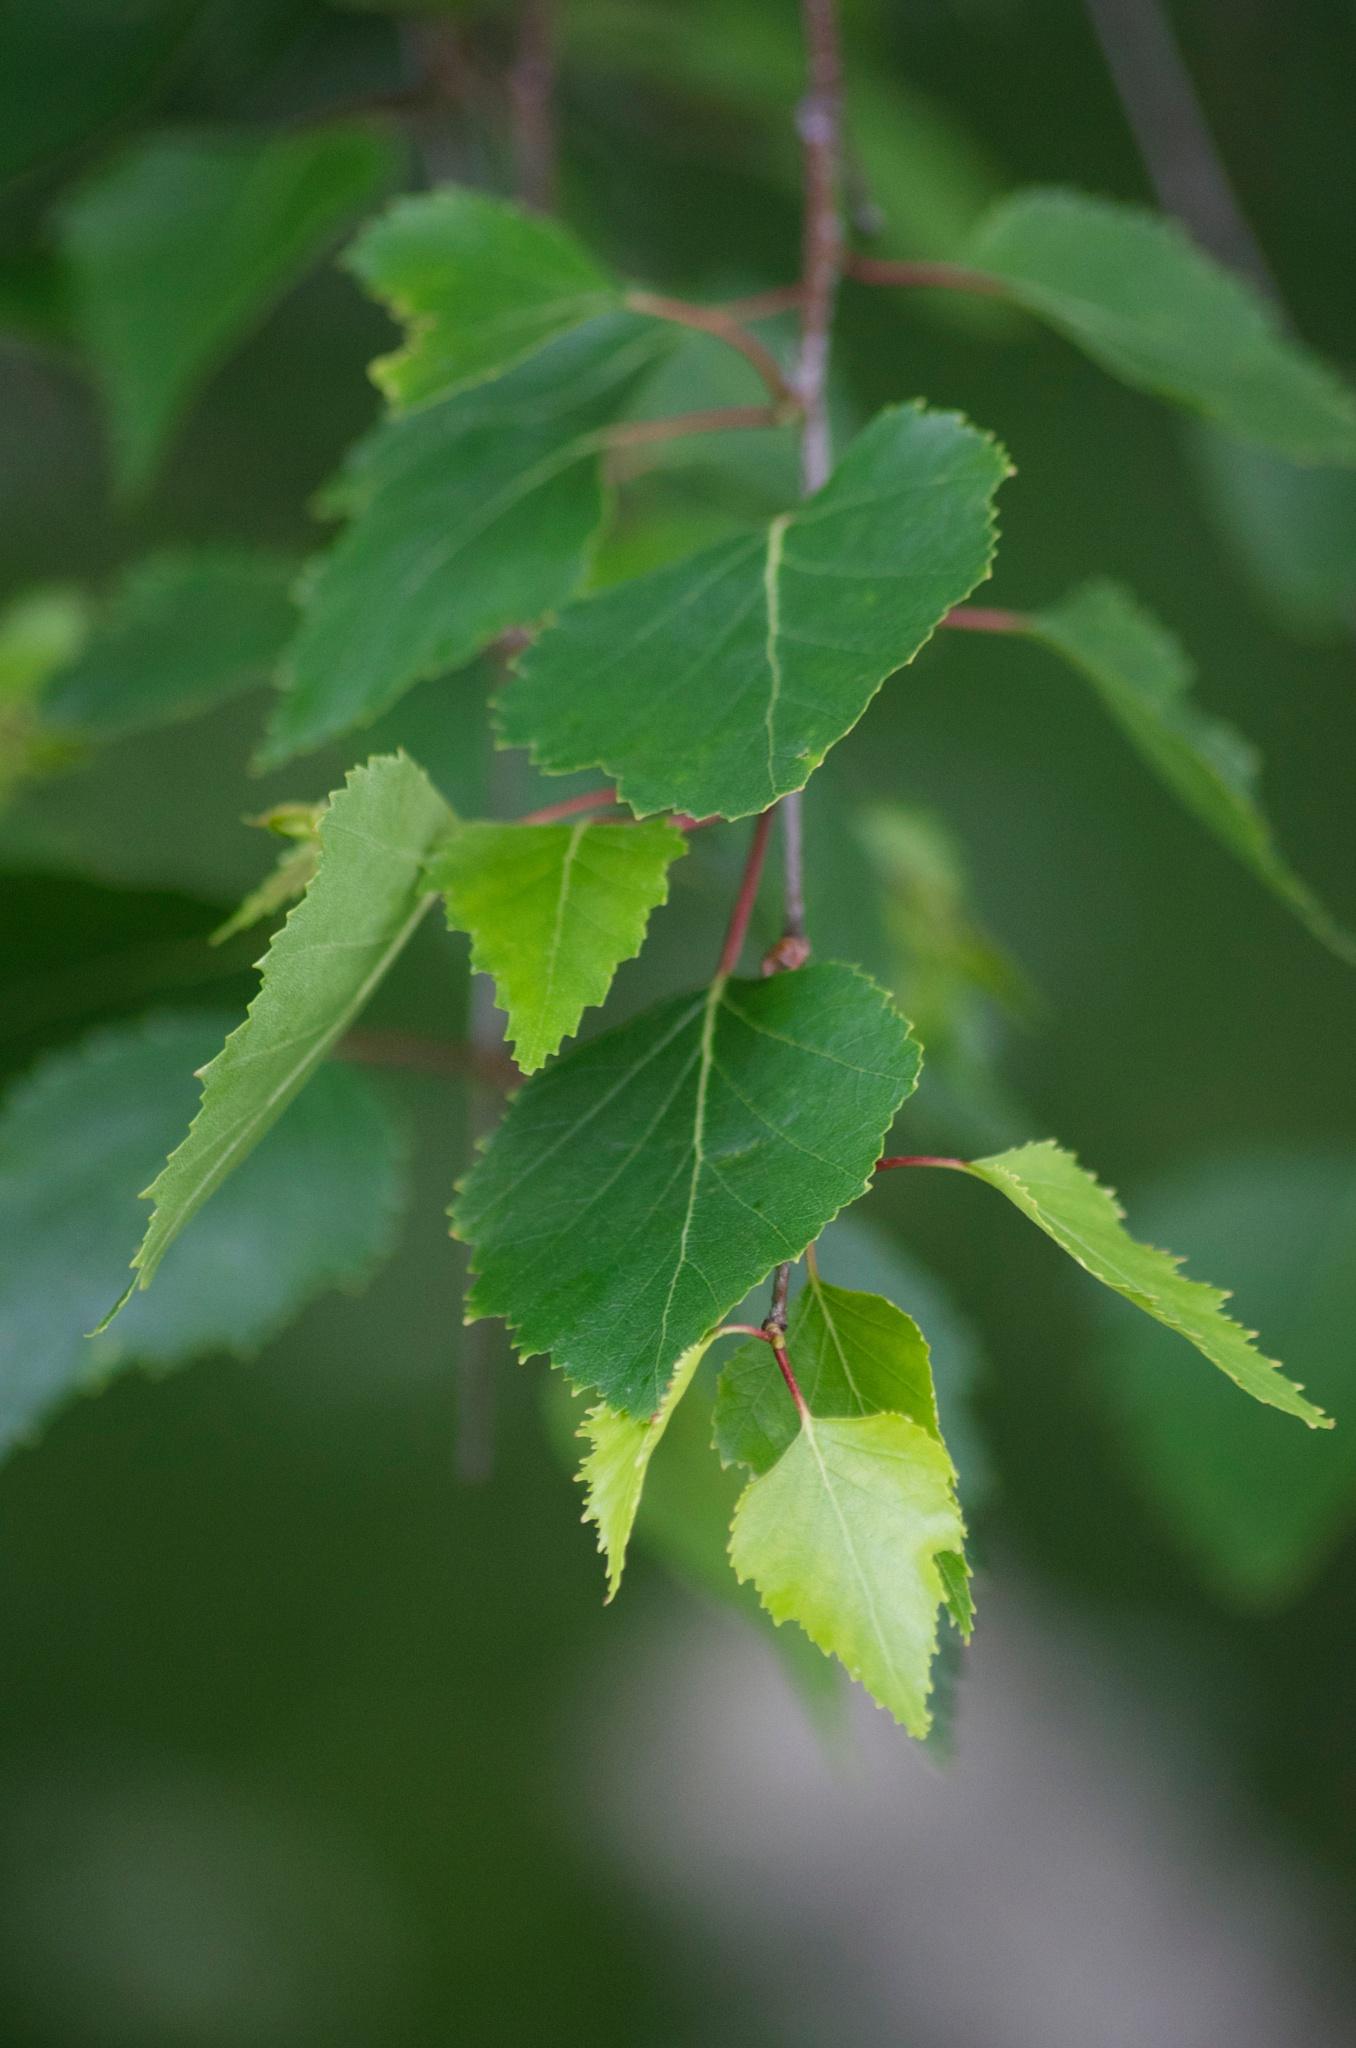 Birch Leaves by Lars-Toralf Utnes Storstrand